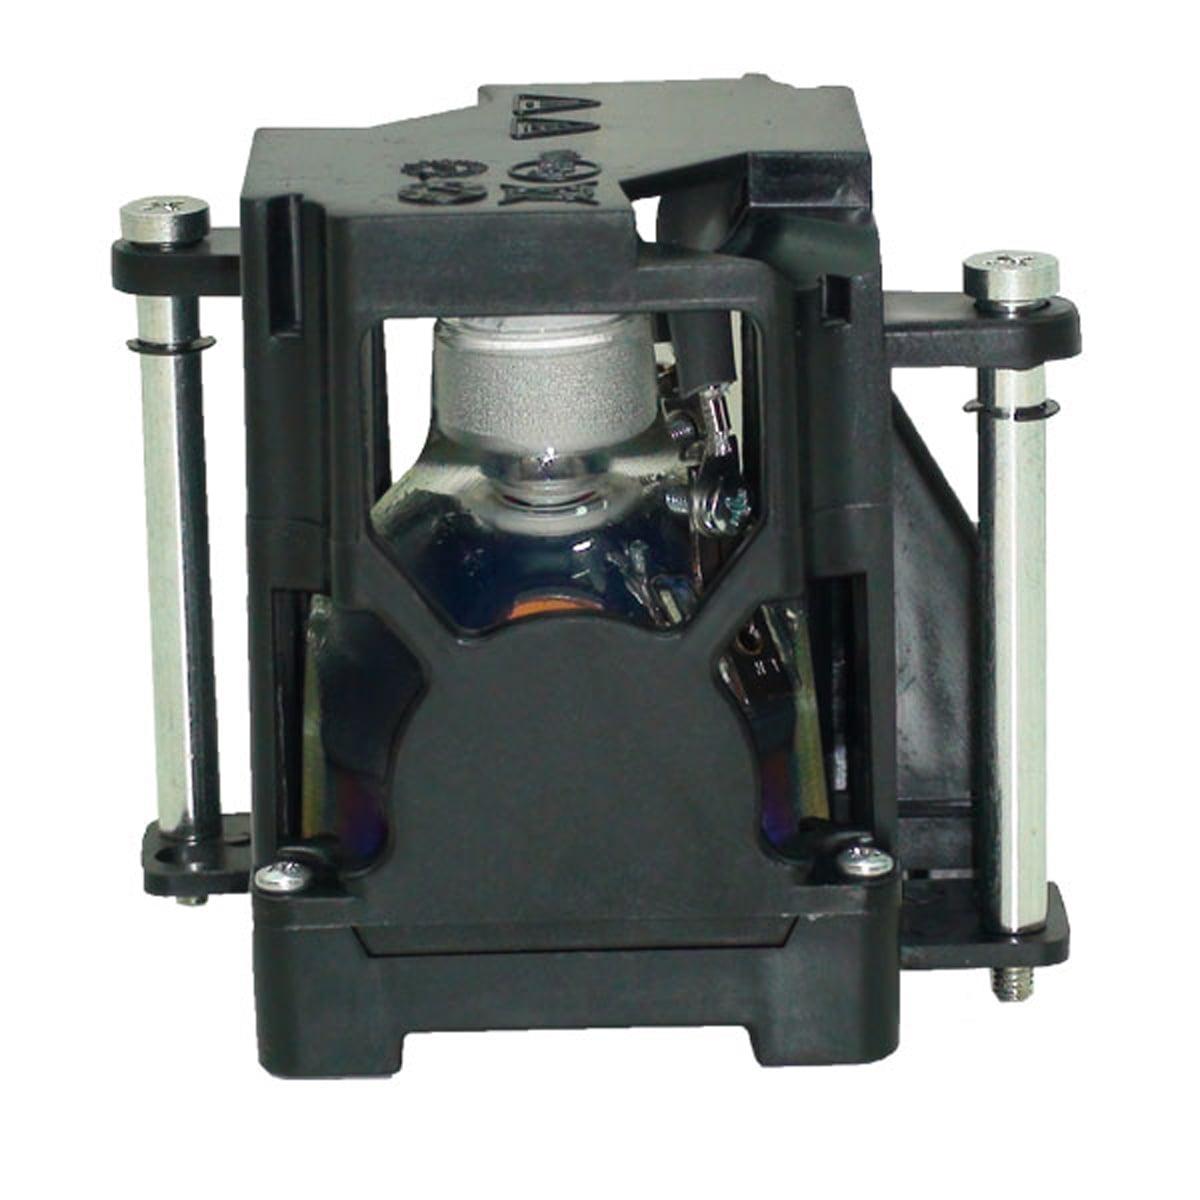 JVC TS-CL110UAA TSCL110UAA BHL5101S LAMP IN HOUSING FOR MODEL HD-61FN97